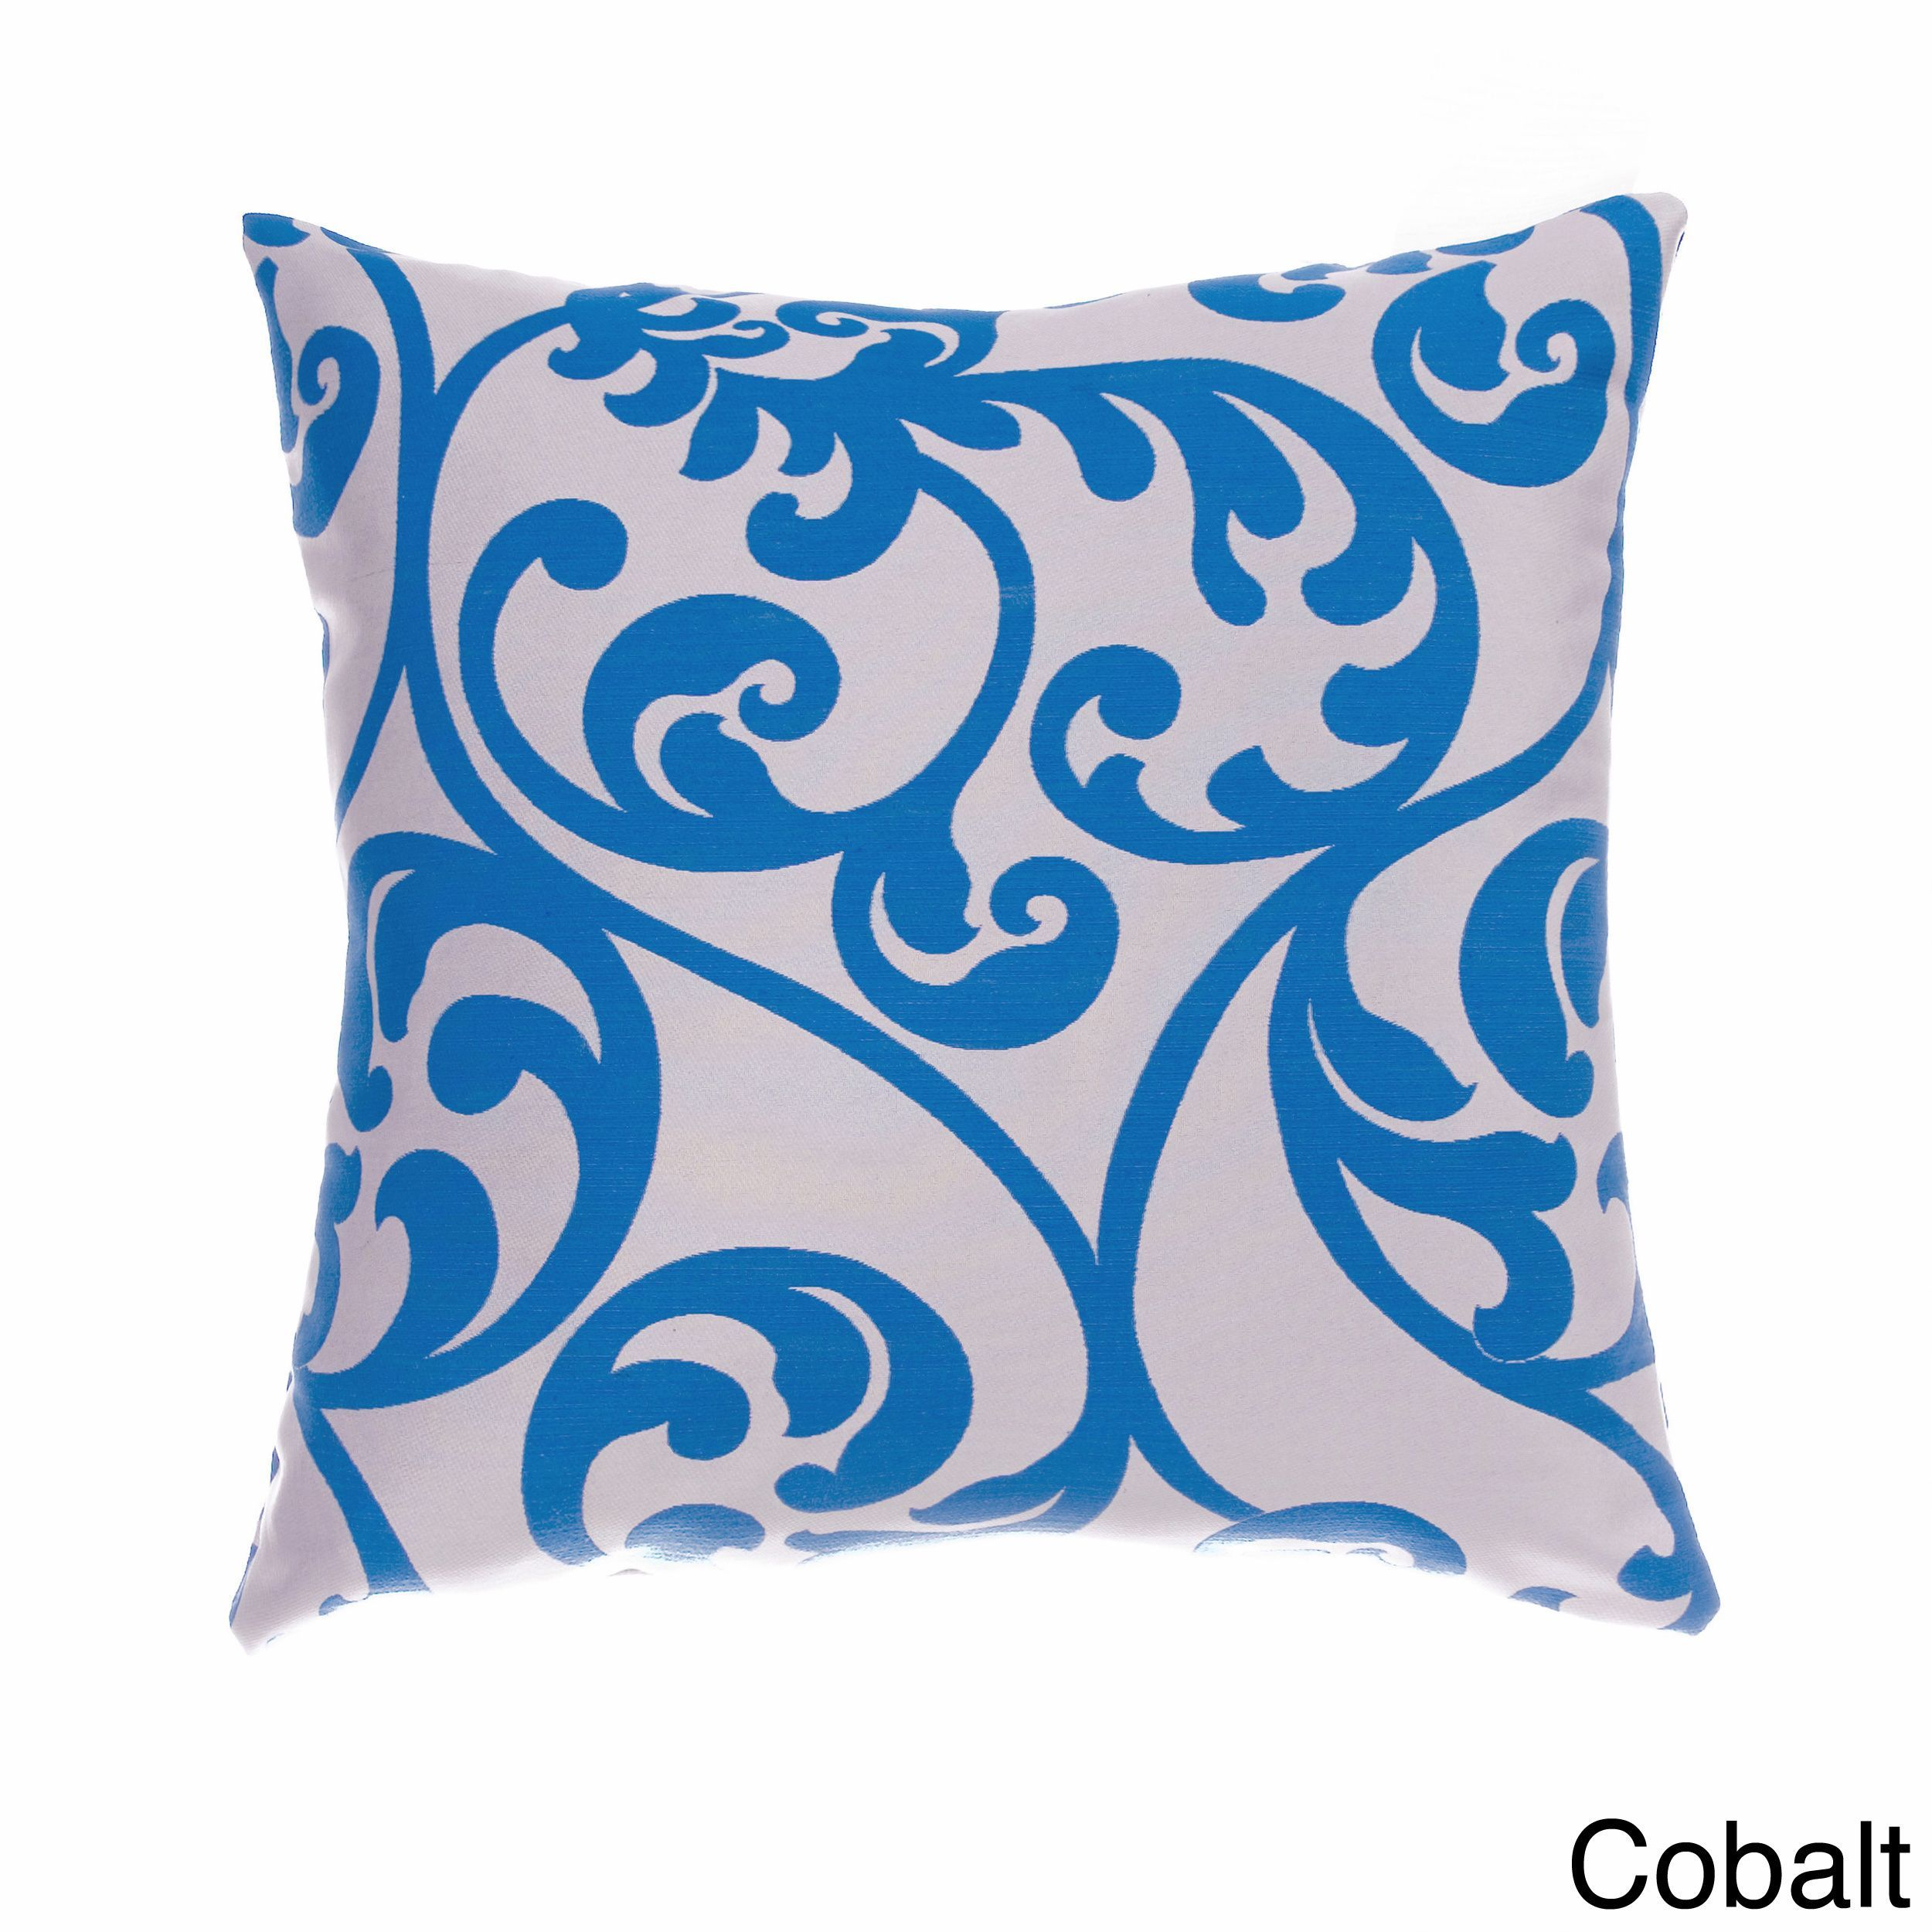 Softline Decorative 20-inch Throw Pillow (Cobalt), Blue, Size 20 x 20 (Cotton, Jacquard)